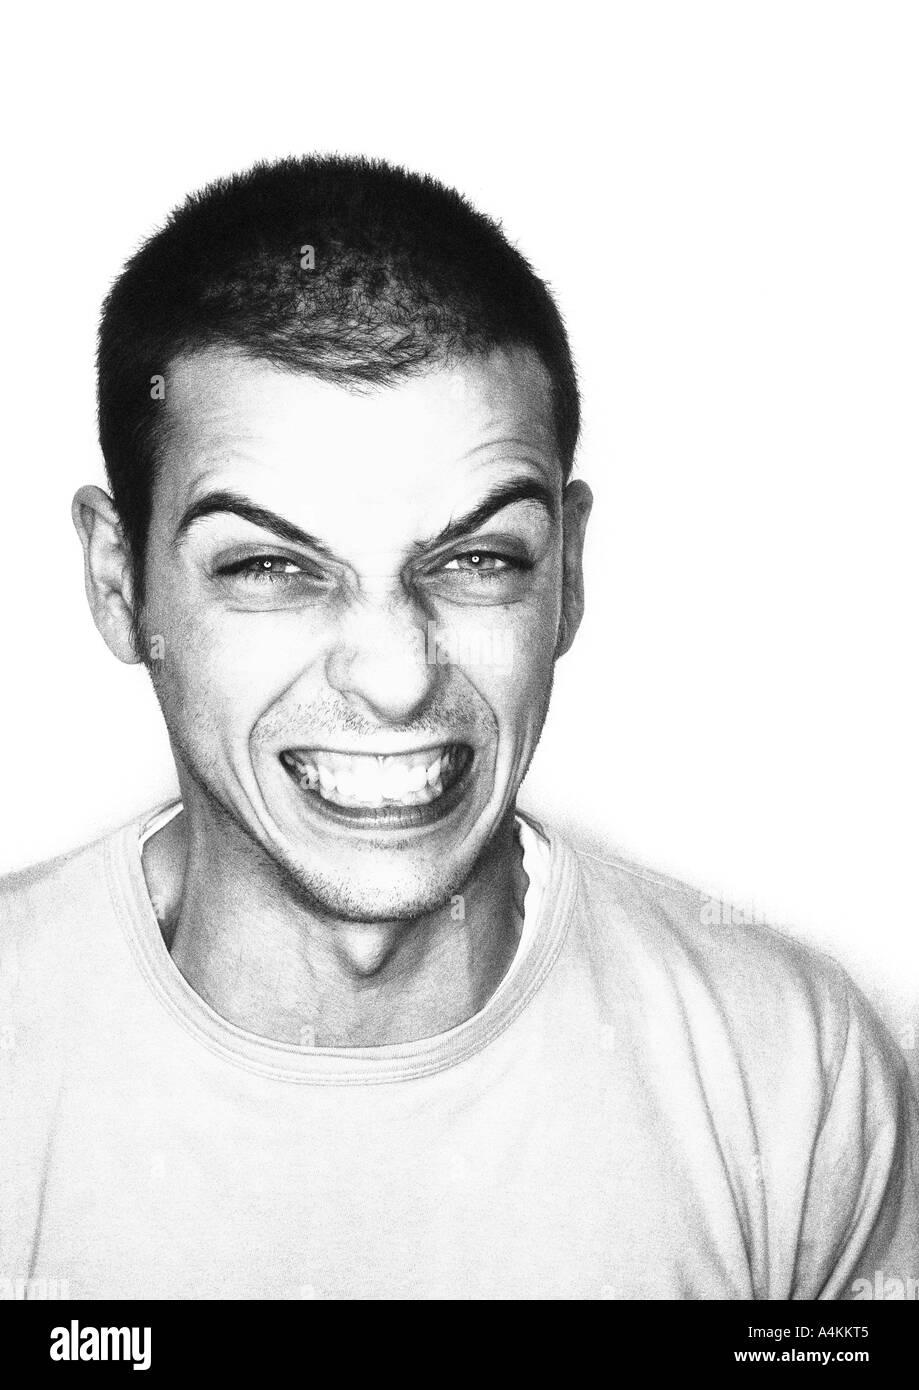 Man grimacing, portrait - Stock Image